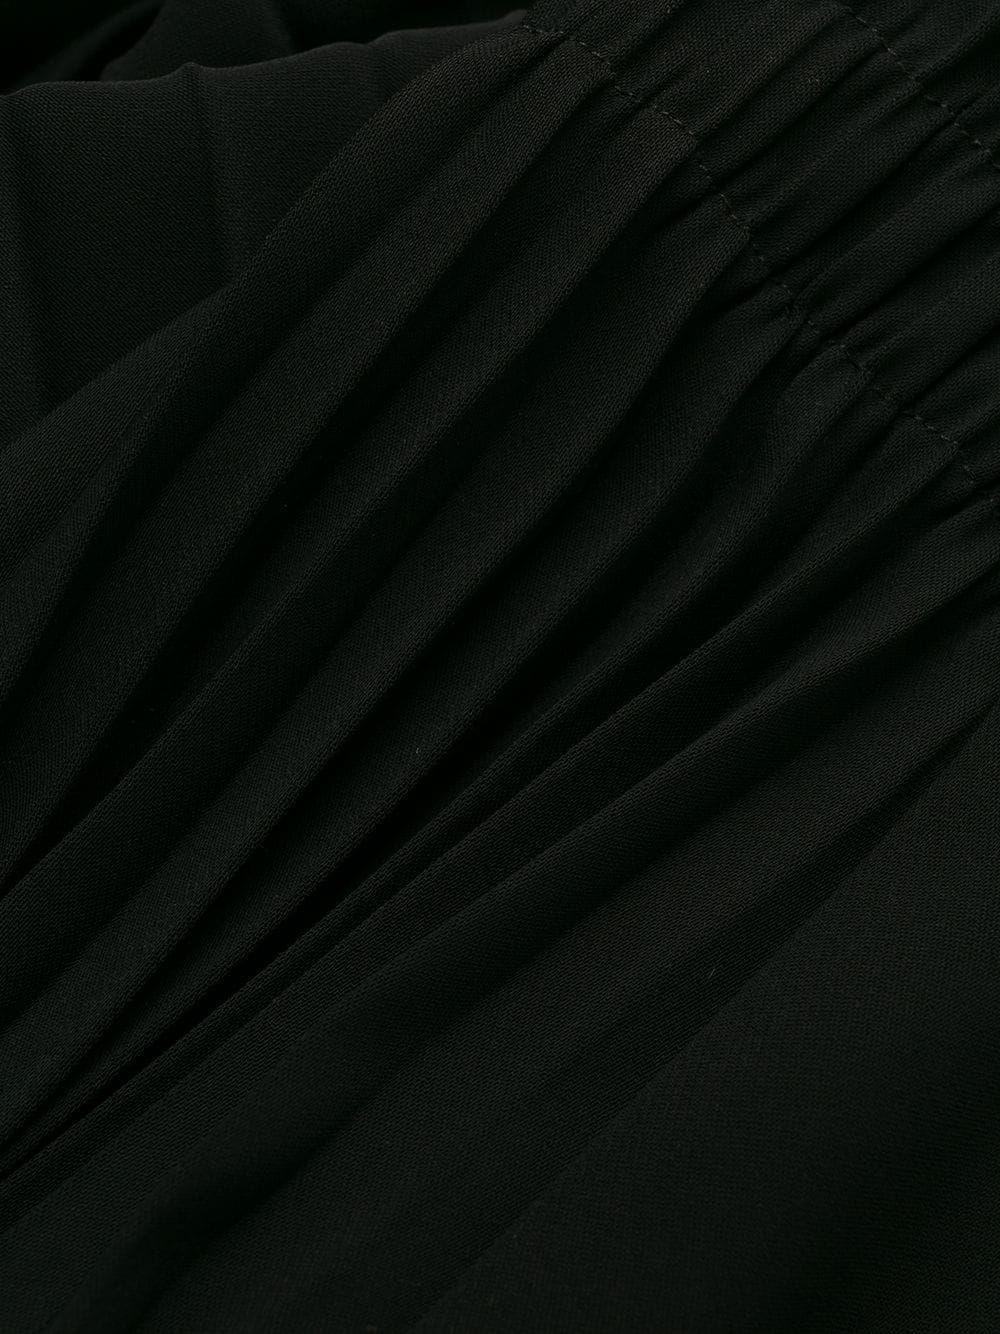 PINKO WOMEN'S 1G14A37628Z99 BLACK POLYESTER SKIRT